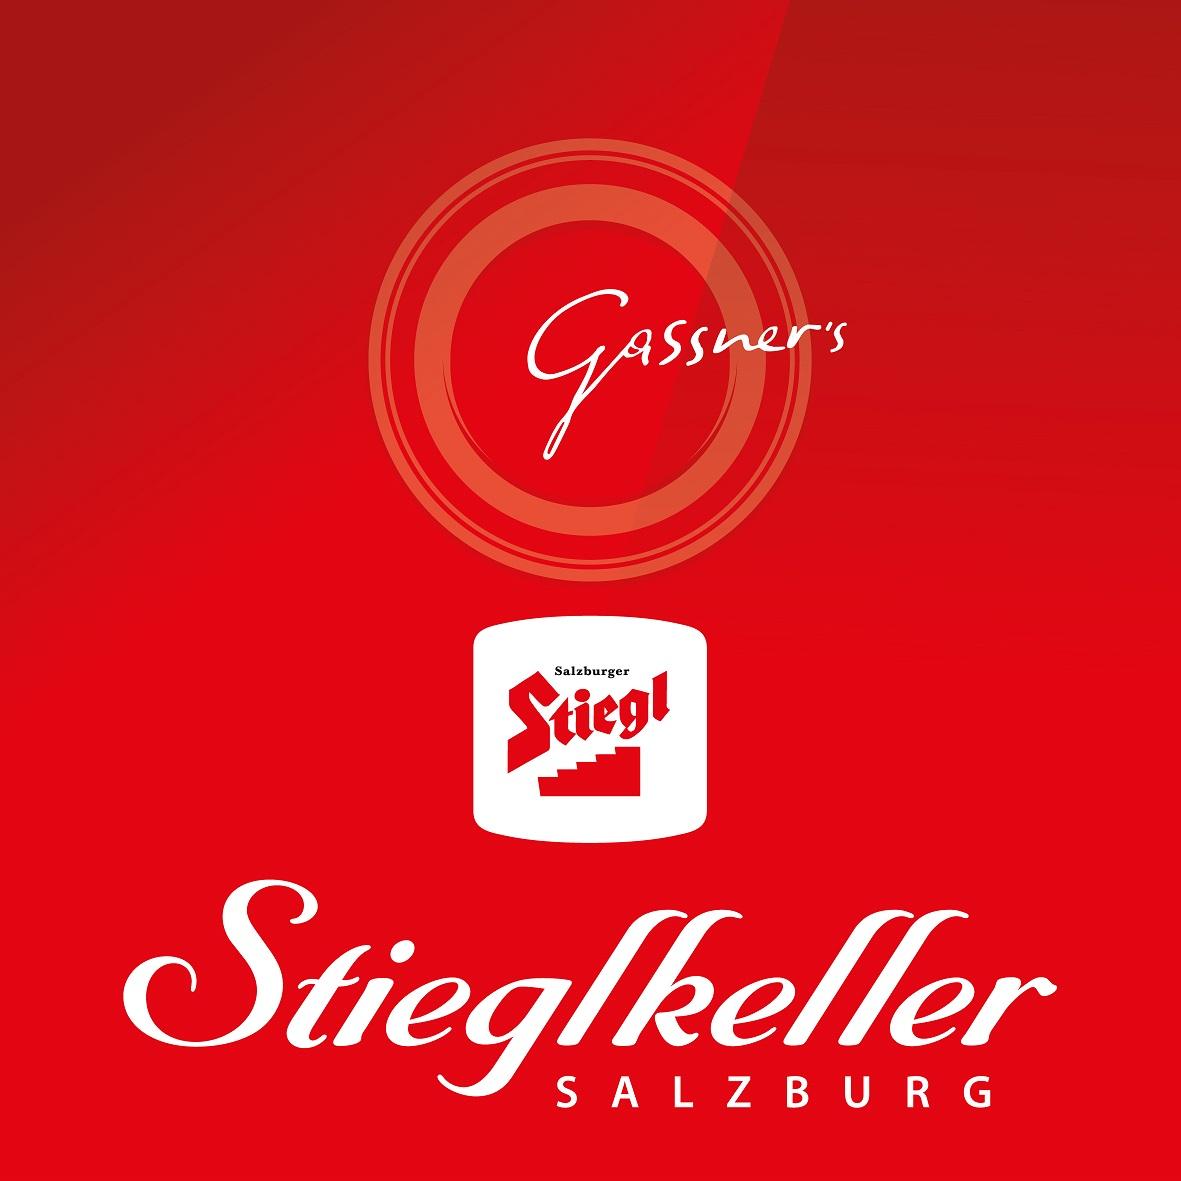 LOGO_Gassner_Stieglkeller-Stiegl_FIN